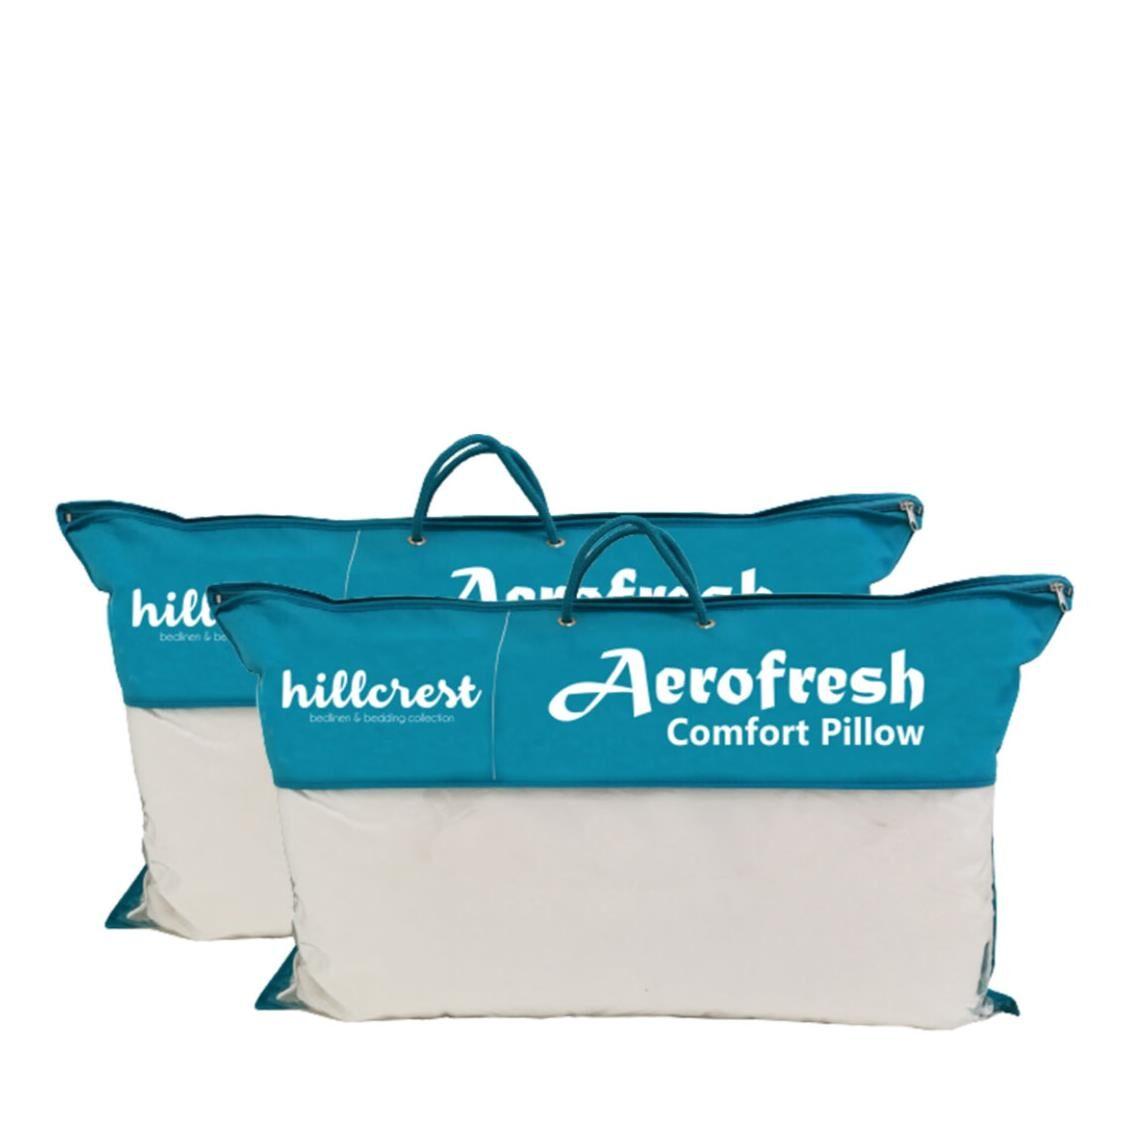 Hillcrest ComfyLux Aerofresh Pillow Bundle of 2